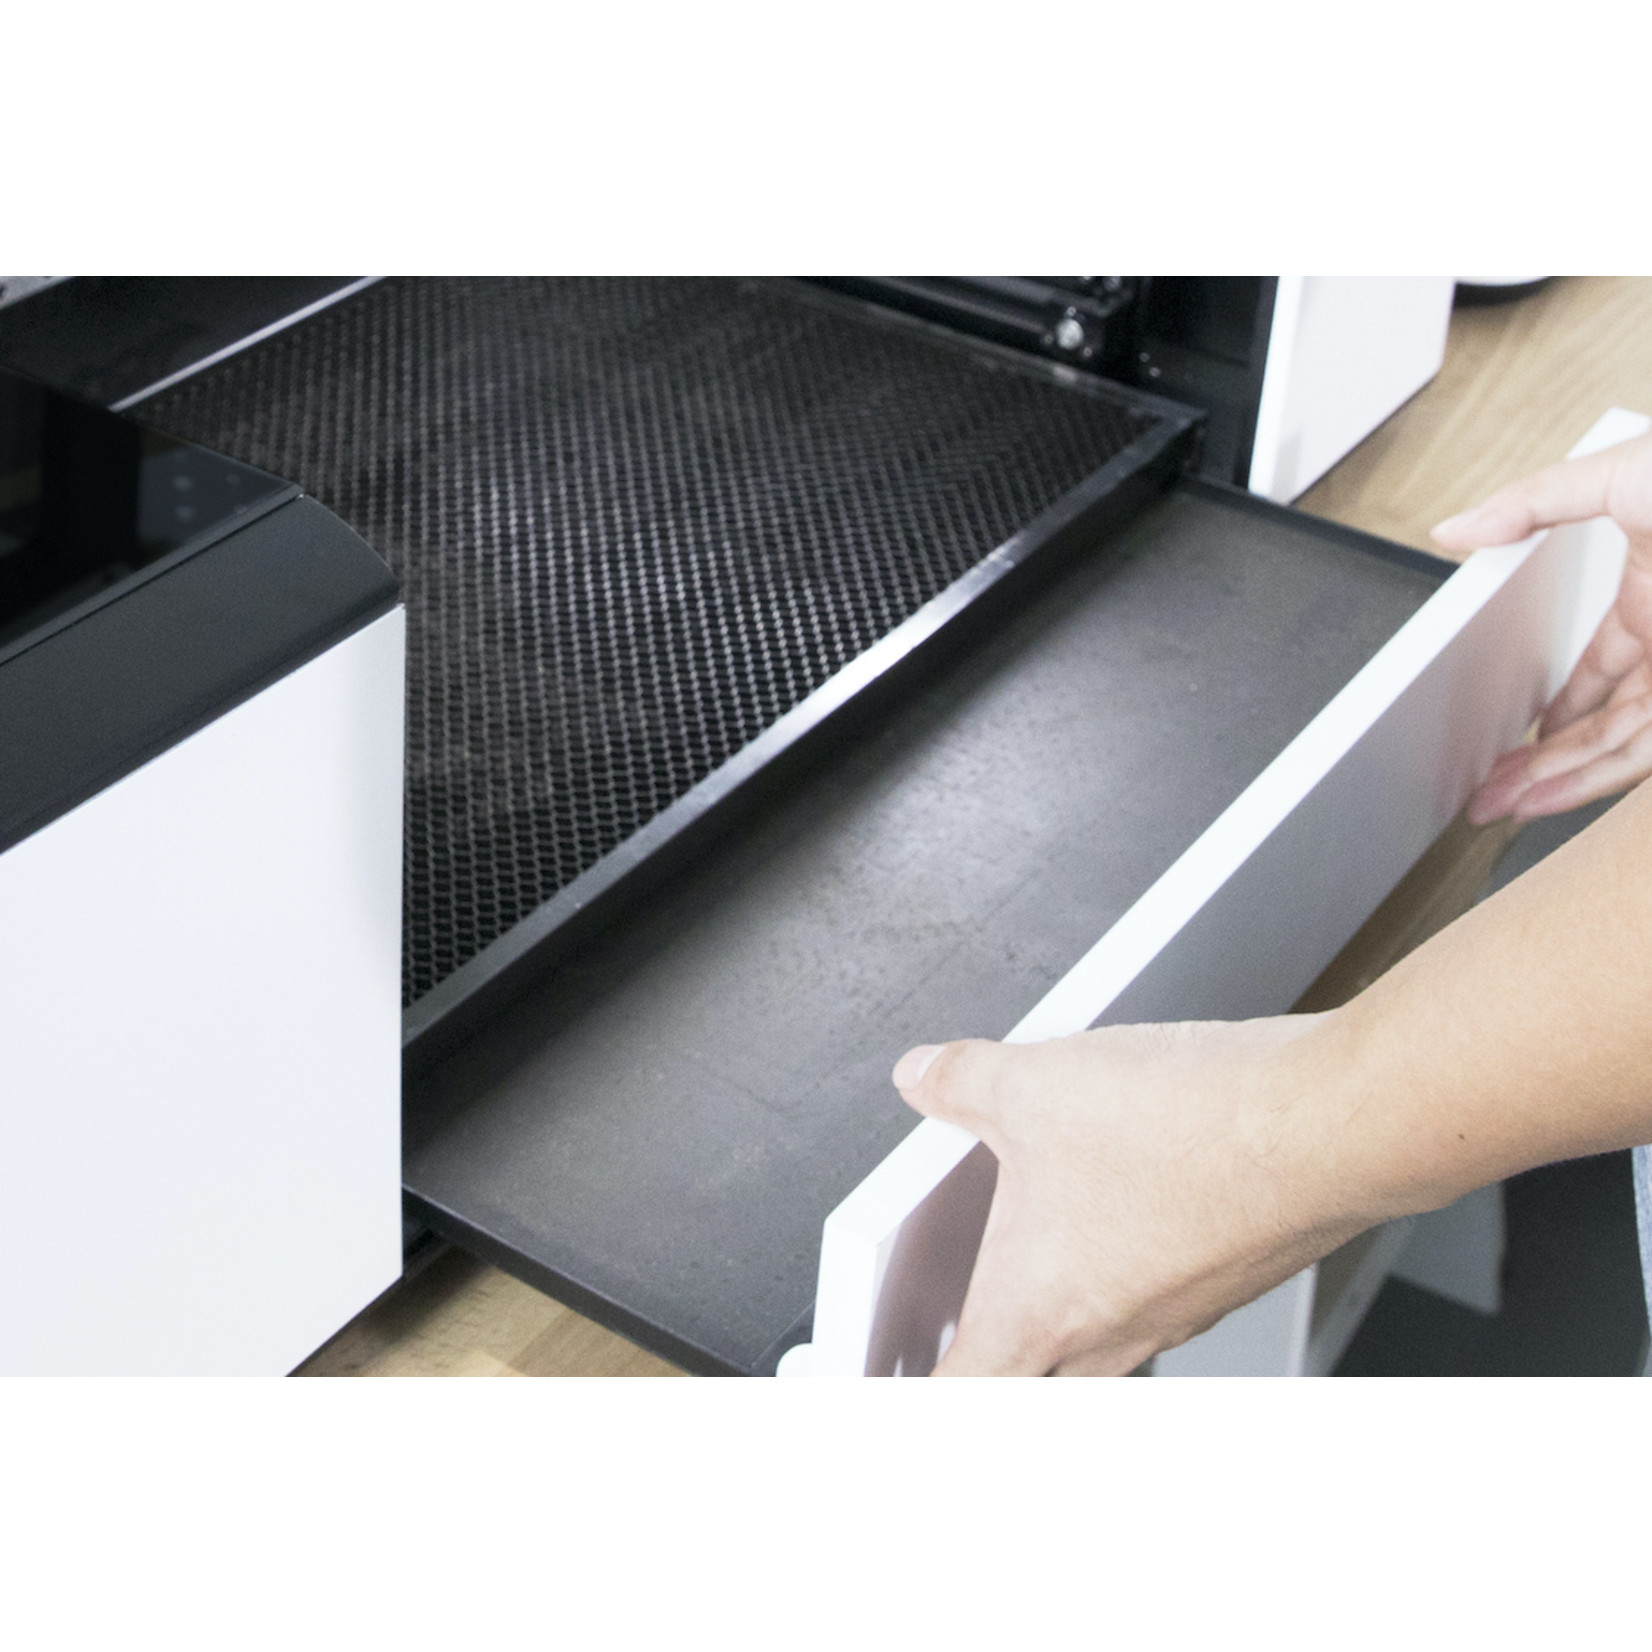 makeblock Laserbox Pro Laser Cutter